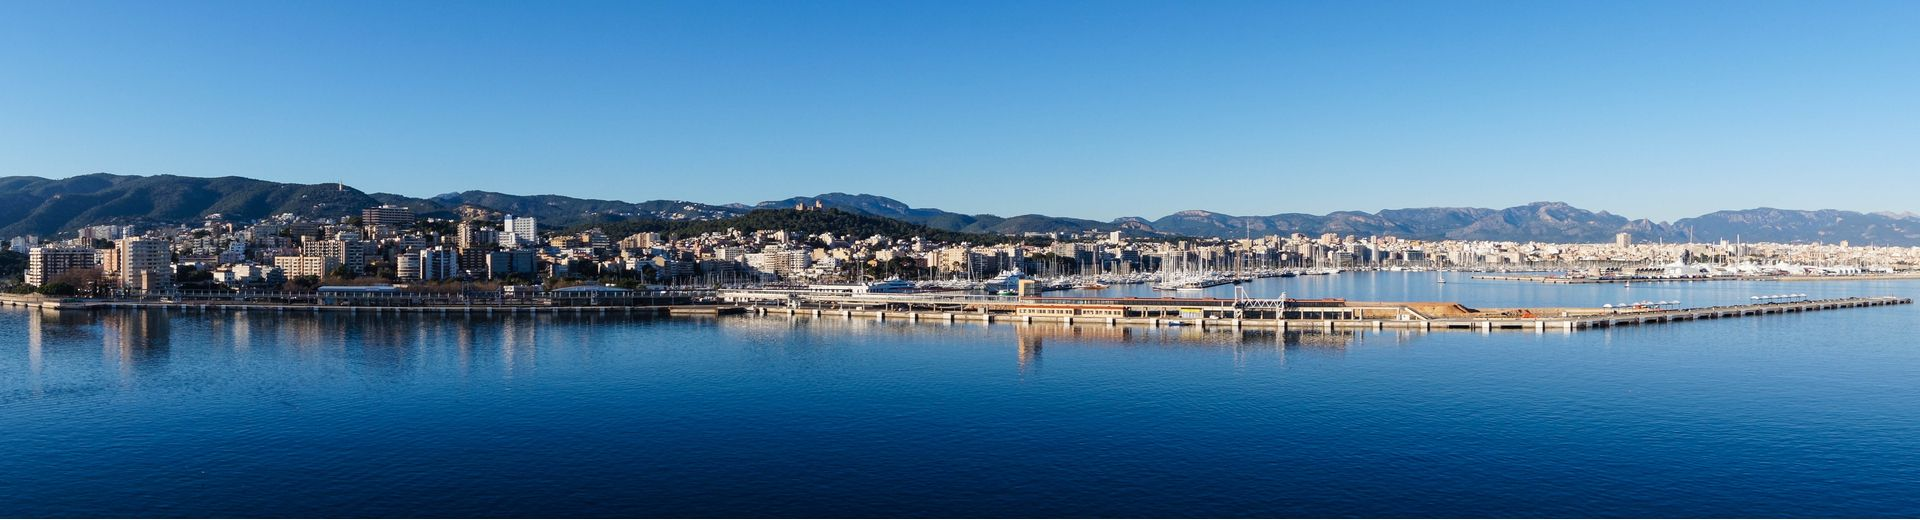 AIDAmira: Mittelmeerkreuzfahrt von Mallorca nach Korfu